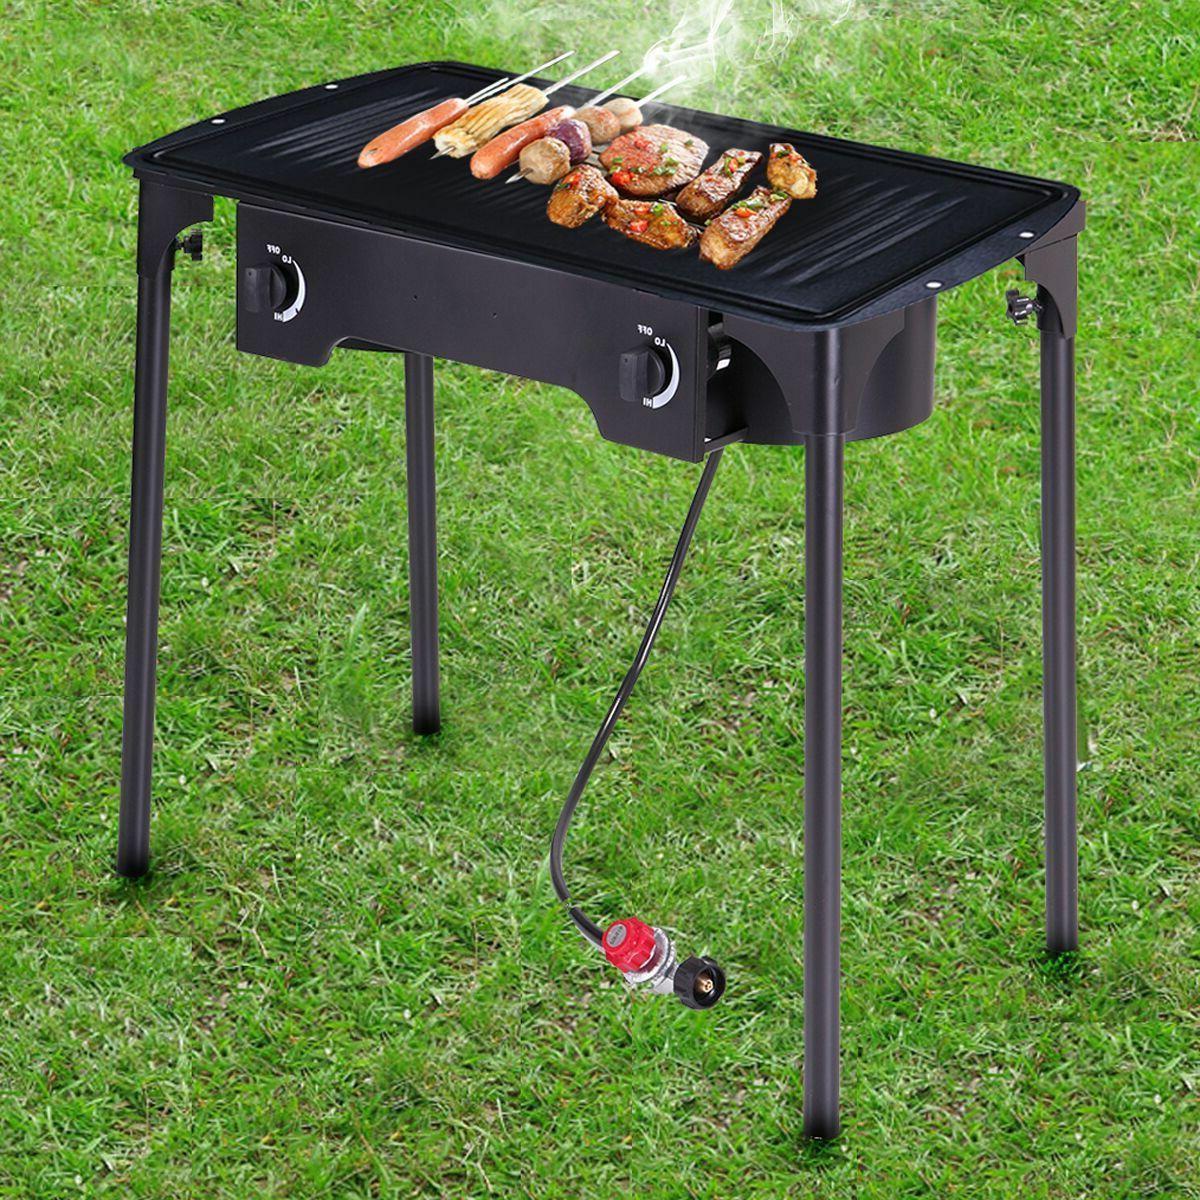 gas grill 2 burner bbq backyard patio